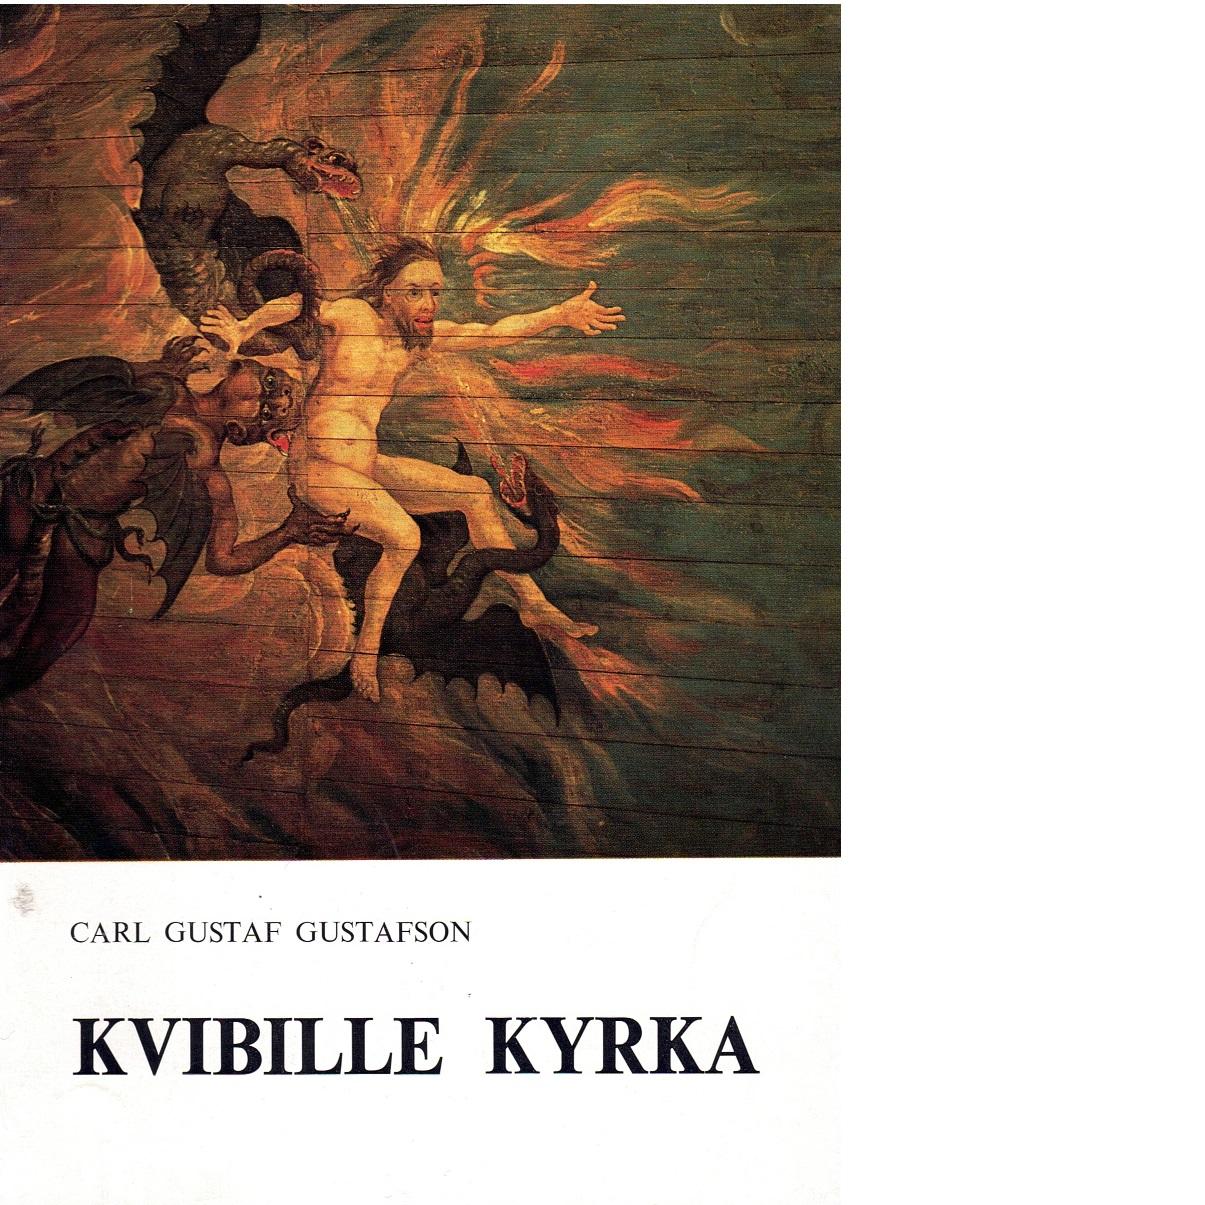 Kvibille kyrka - Gustafson, Carl Gustaf